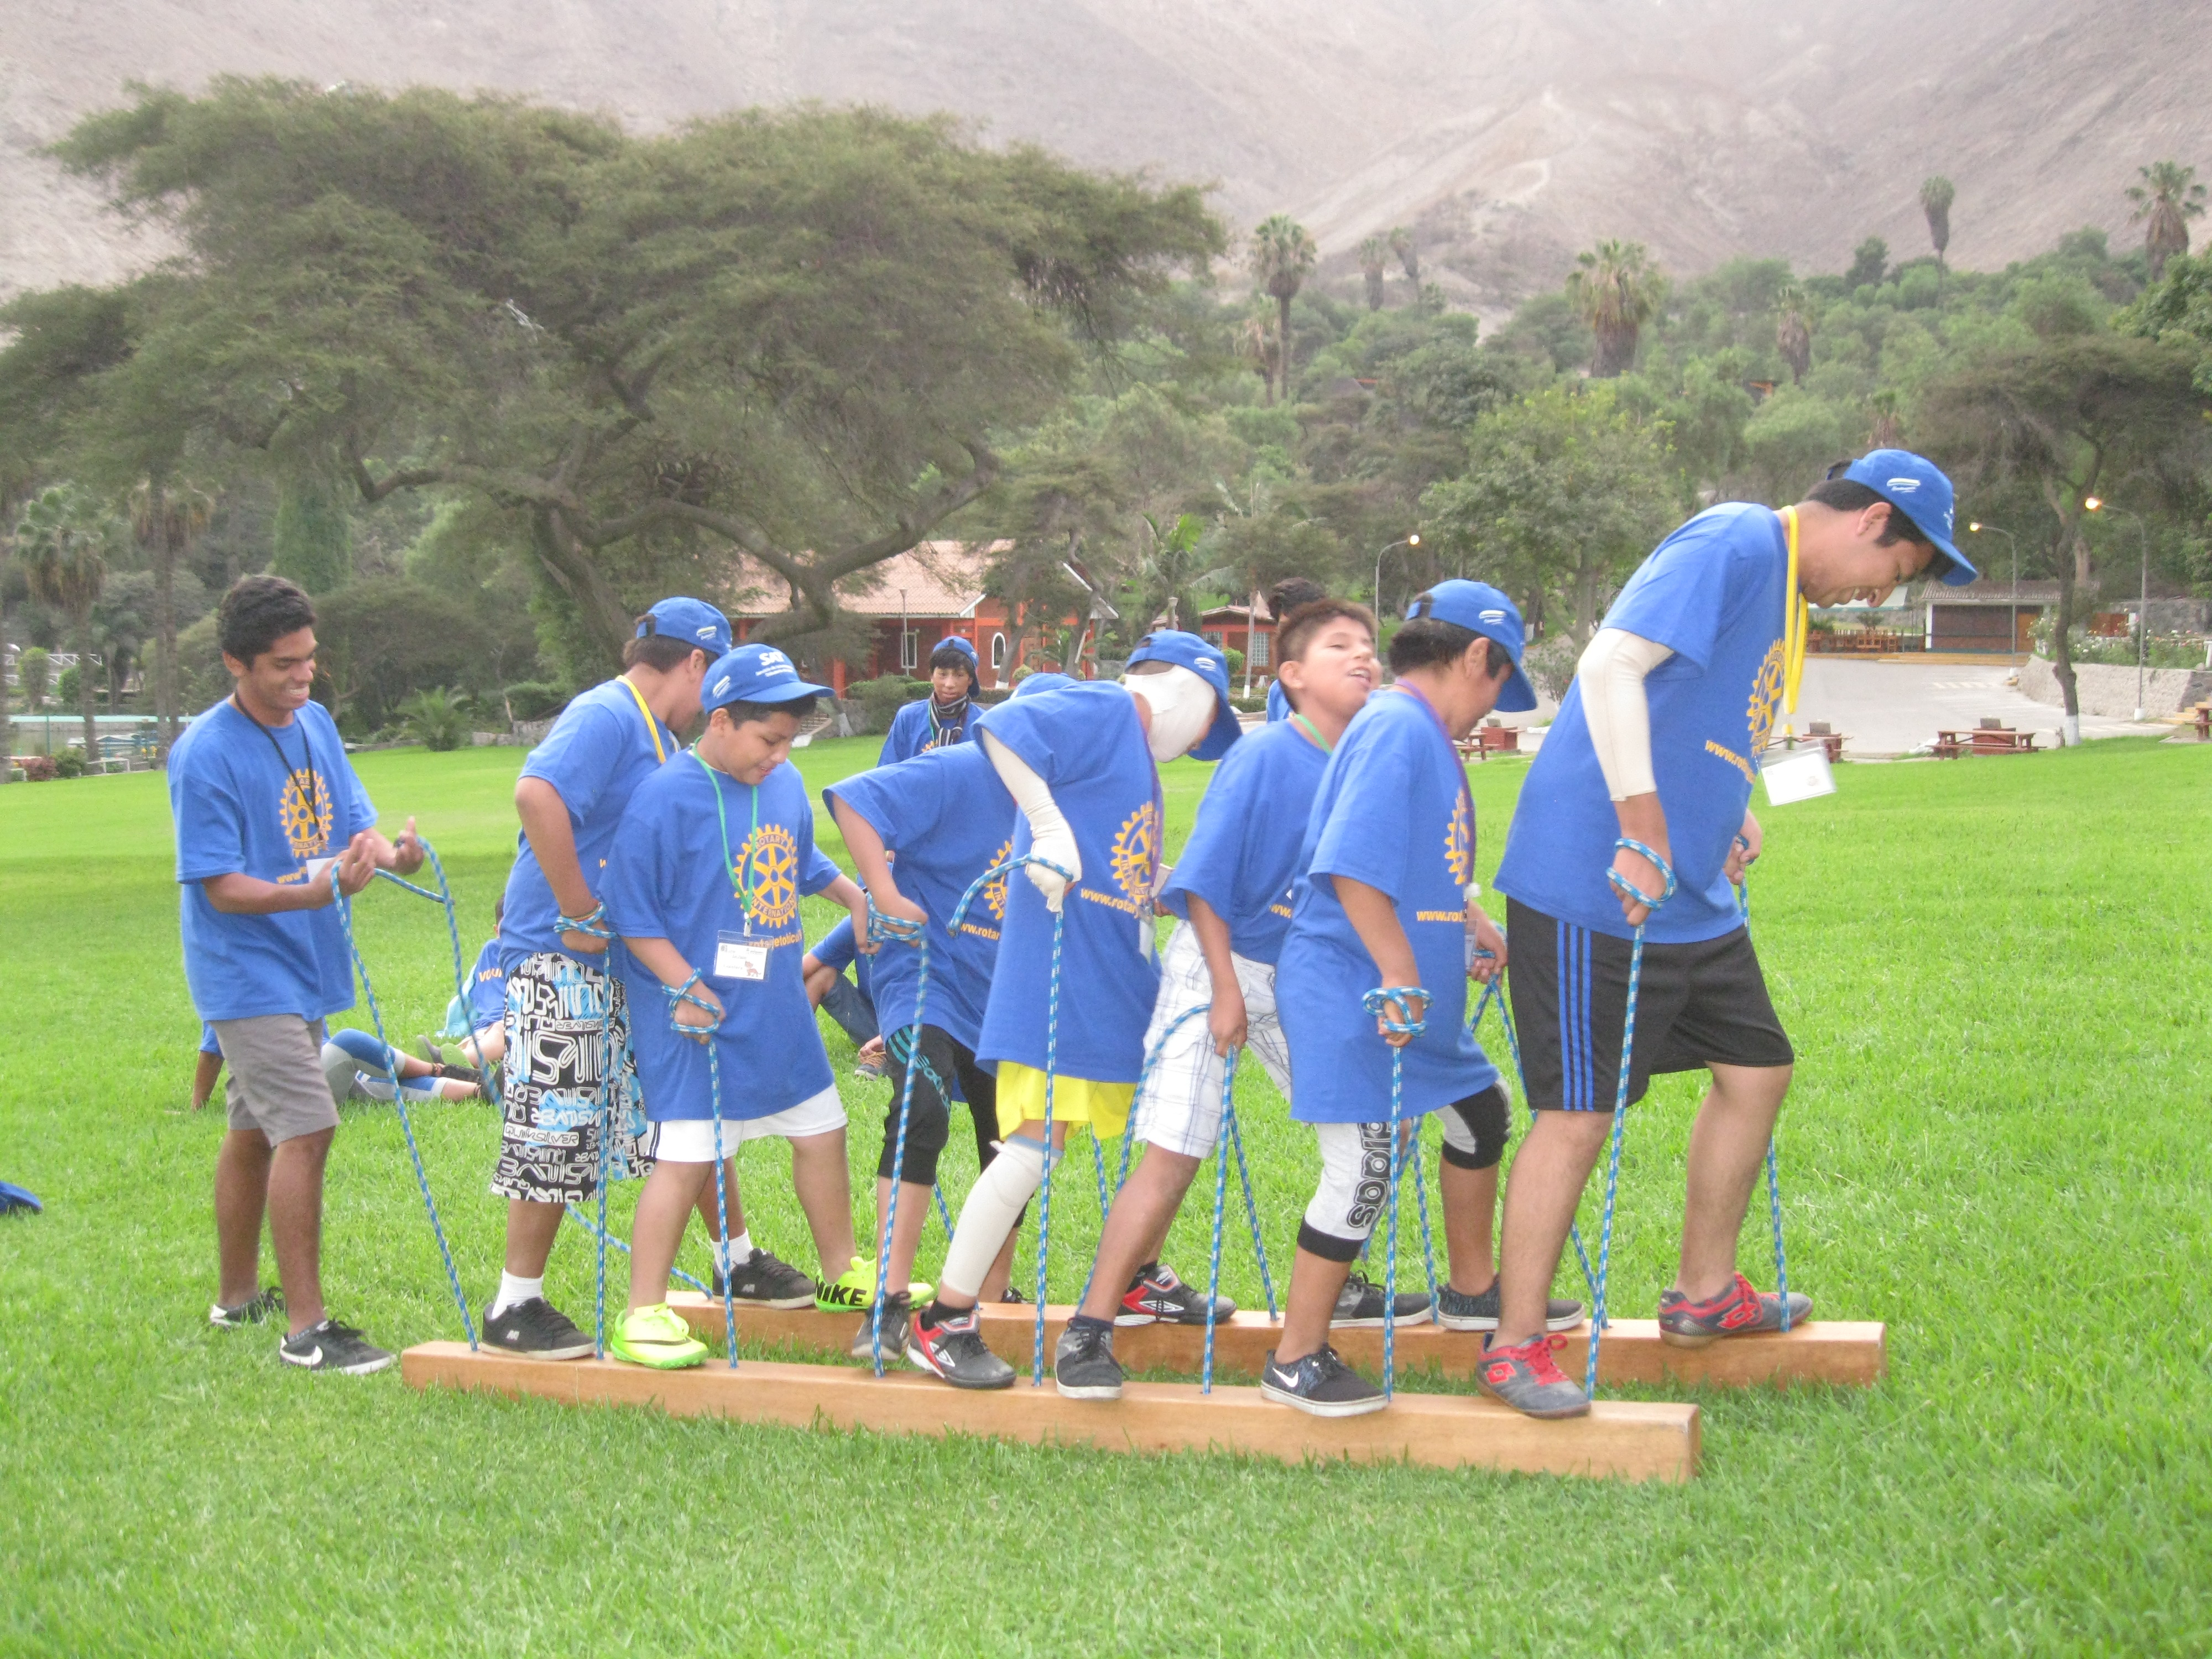 Campers play at CAFA burn camp